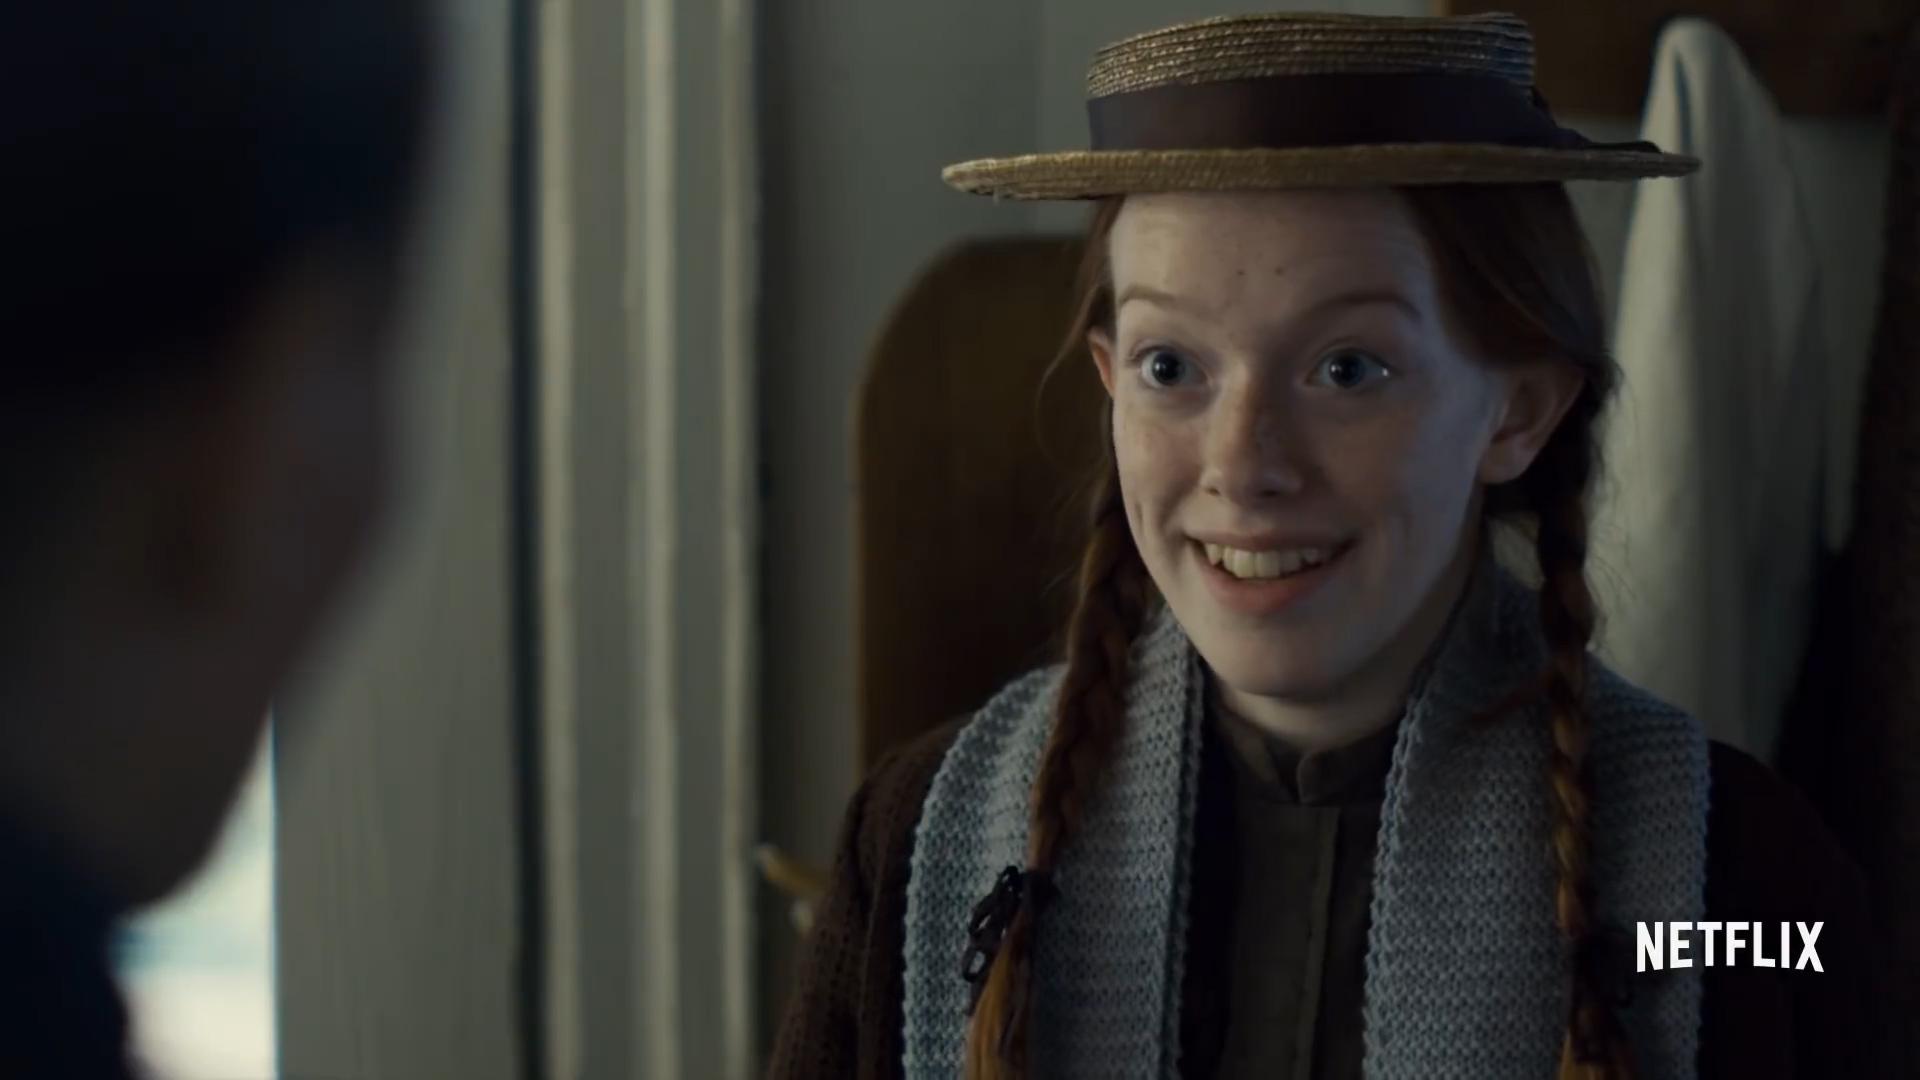 Anne with an E - Season 2 Official Trailer